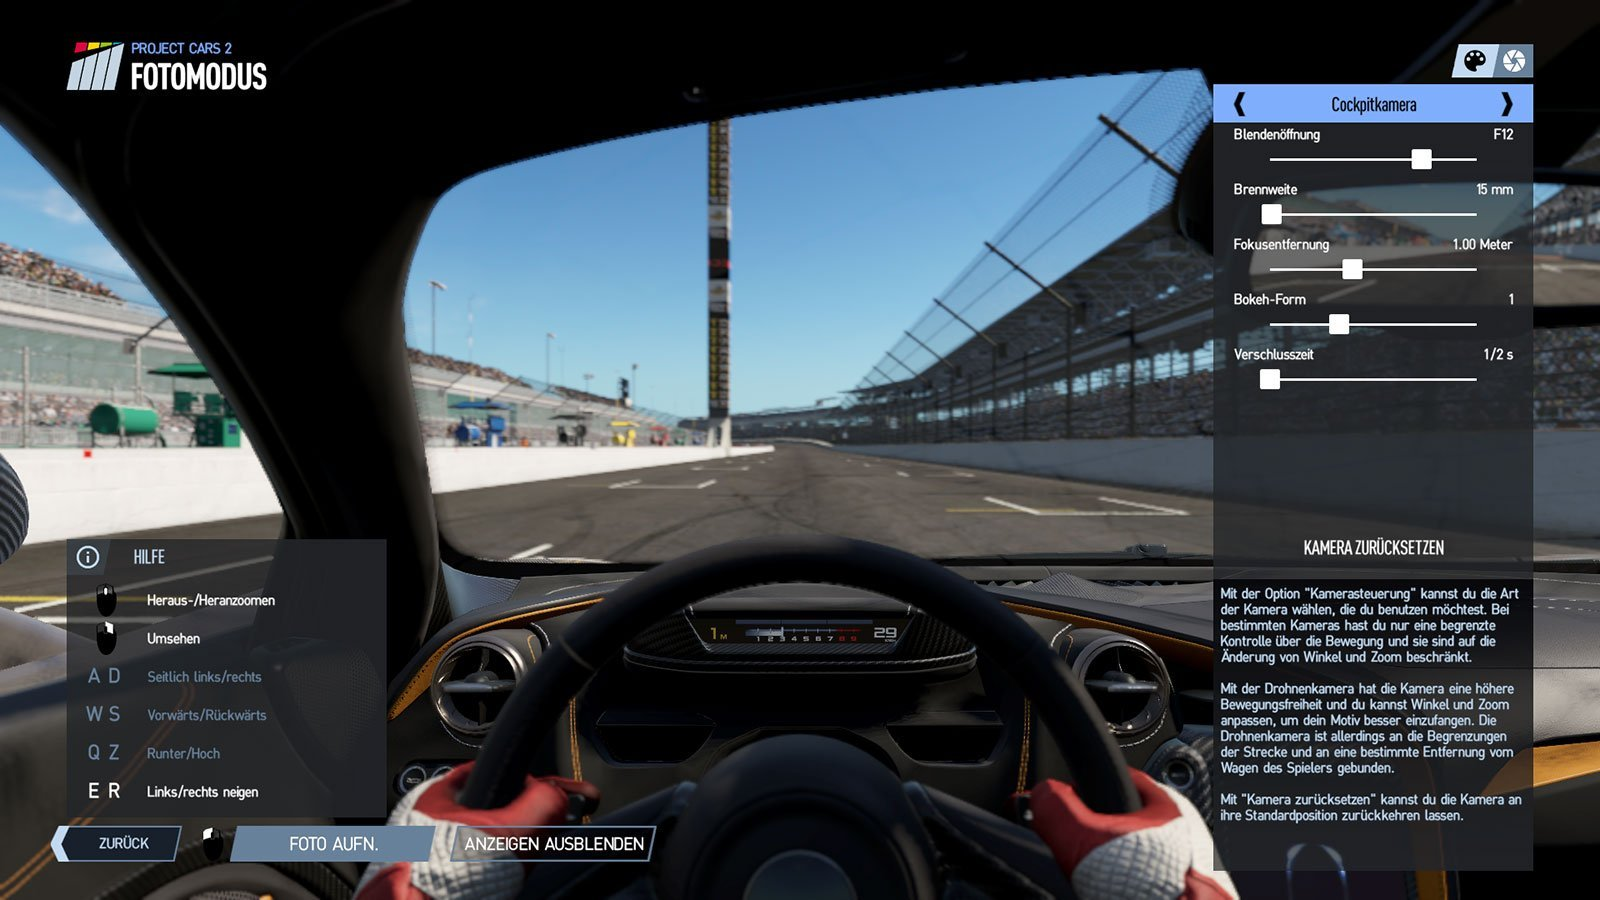 Project Cars 2 Screenshot 2017.09.21 01.39.23